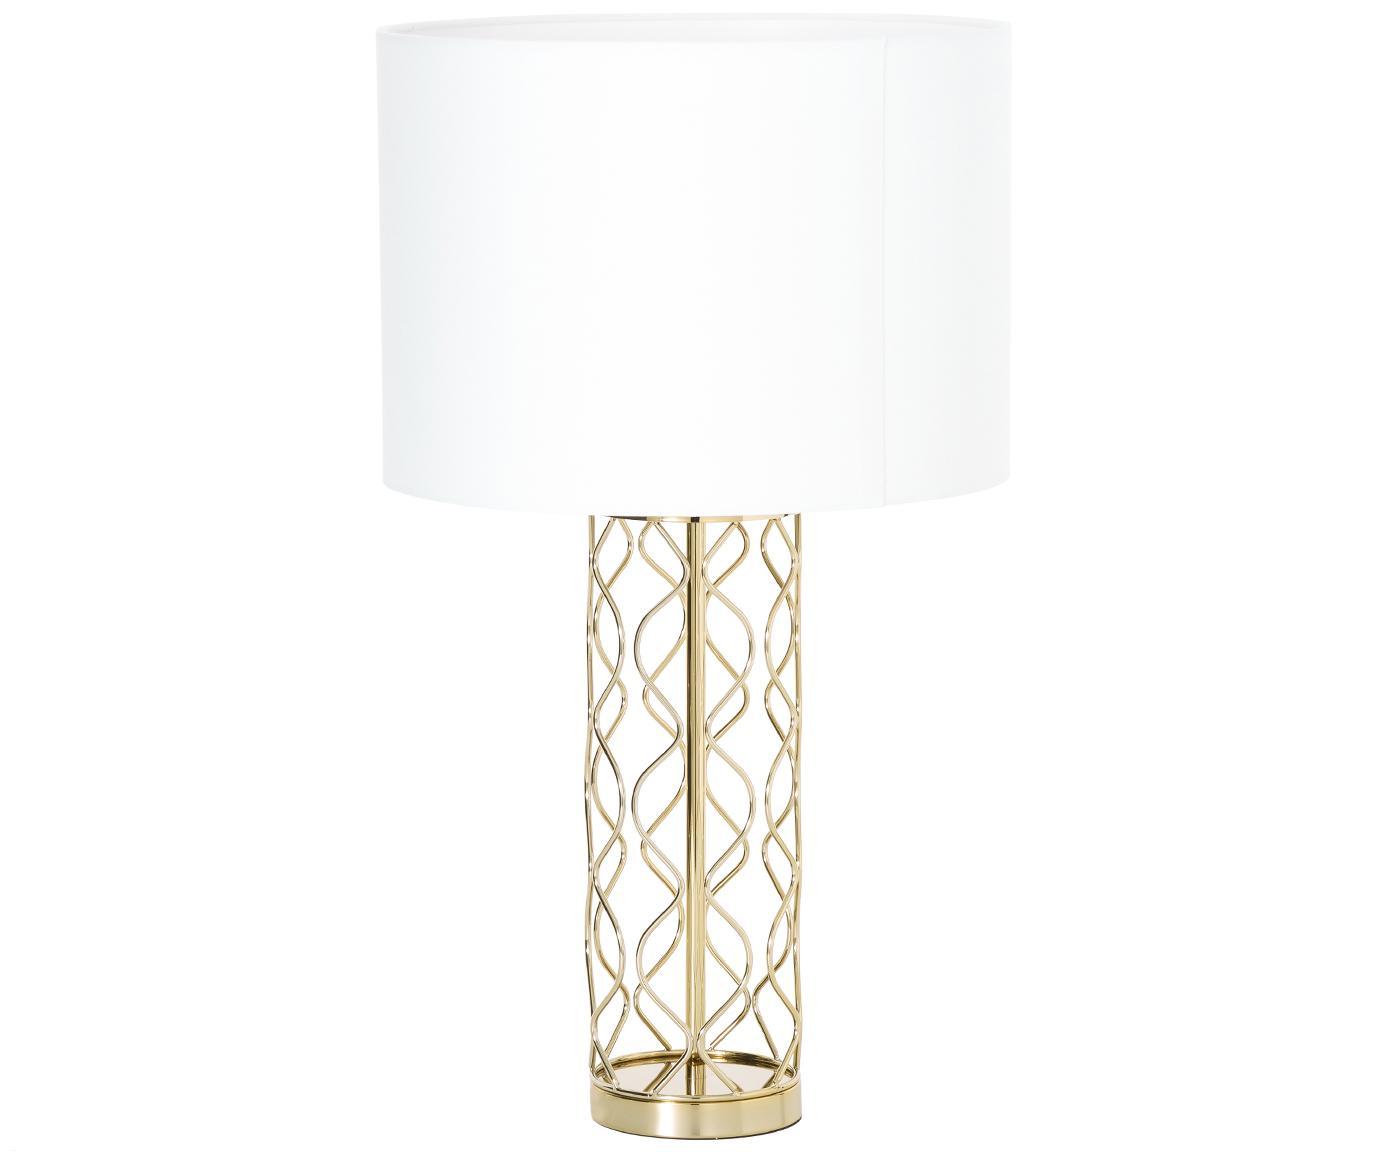 Tafellamp Adelaide, Lampenkap: textiel, Lampvoet: metaal, Lampenkap: crèmekleurig. Lampvoet: goudkleurig, Ø 35 x H 62 cm